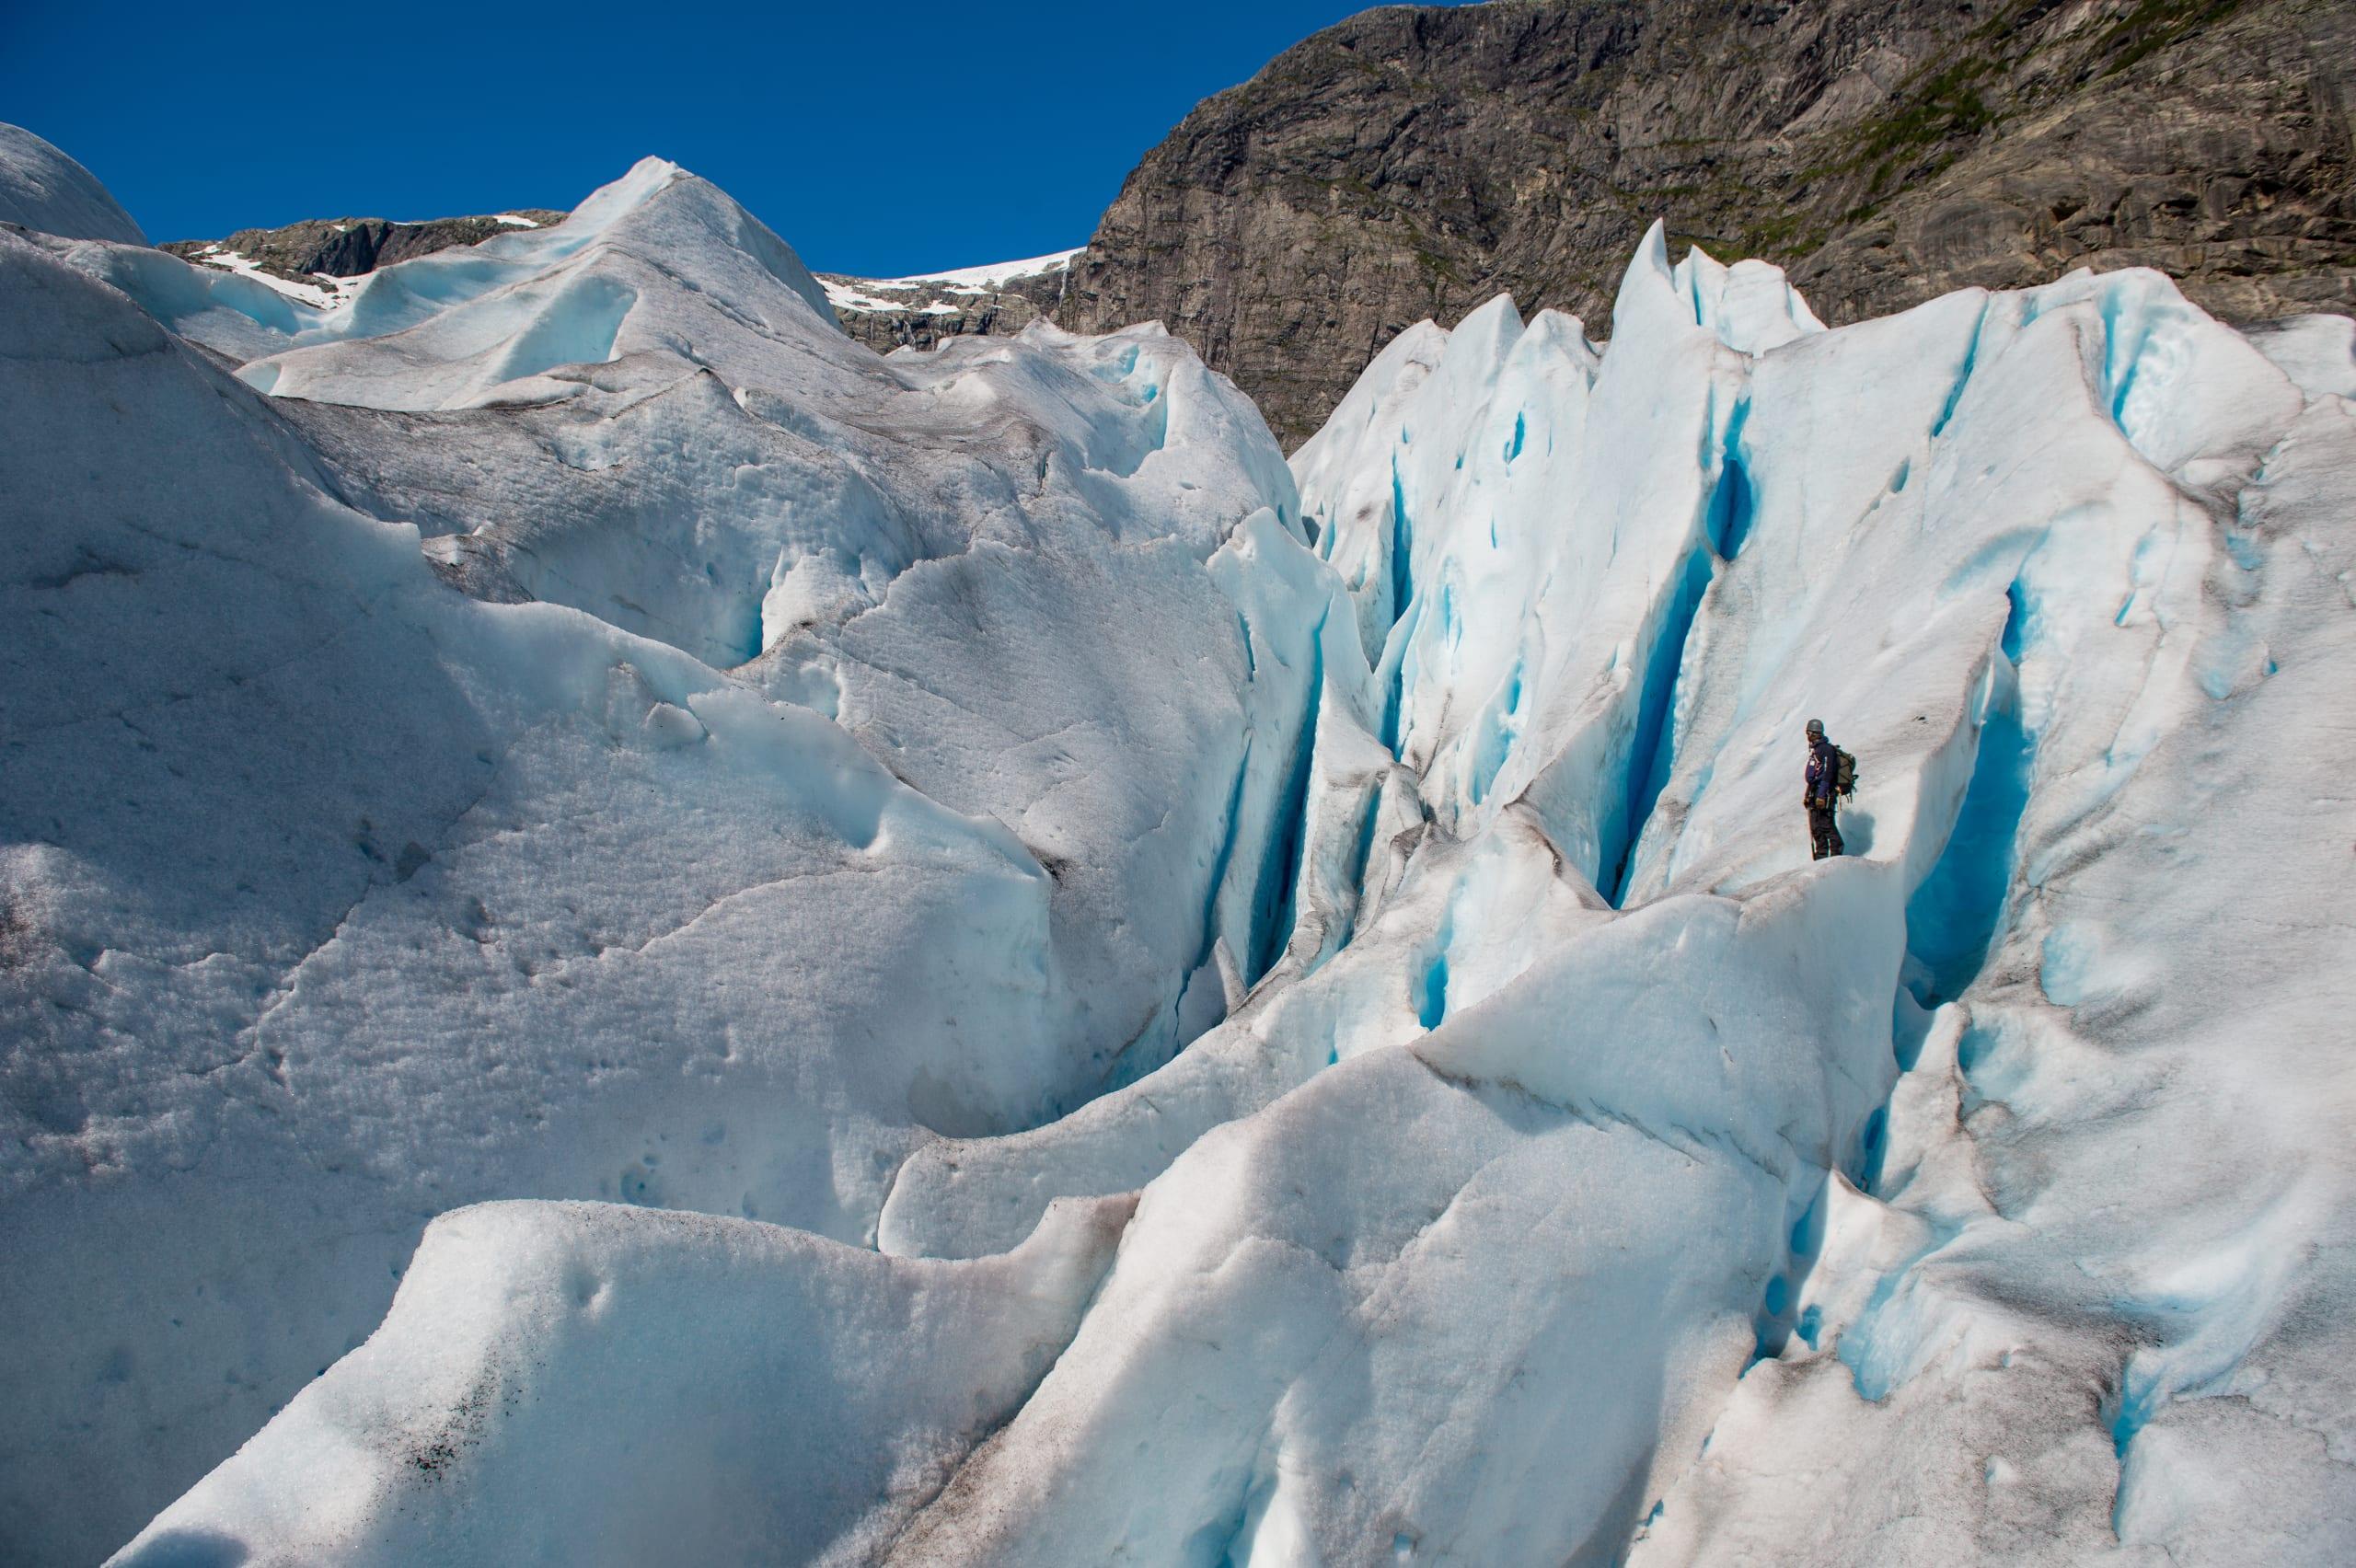 Blue ice hiking at Nigardsbreen